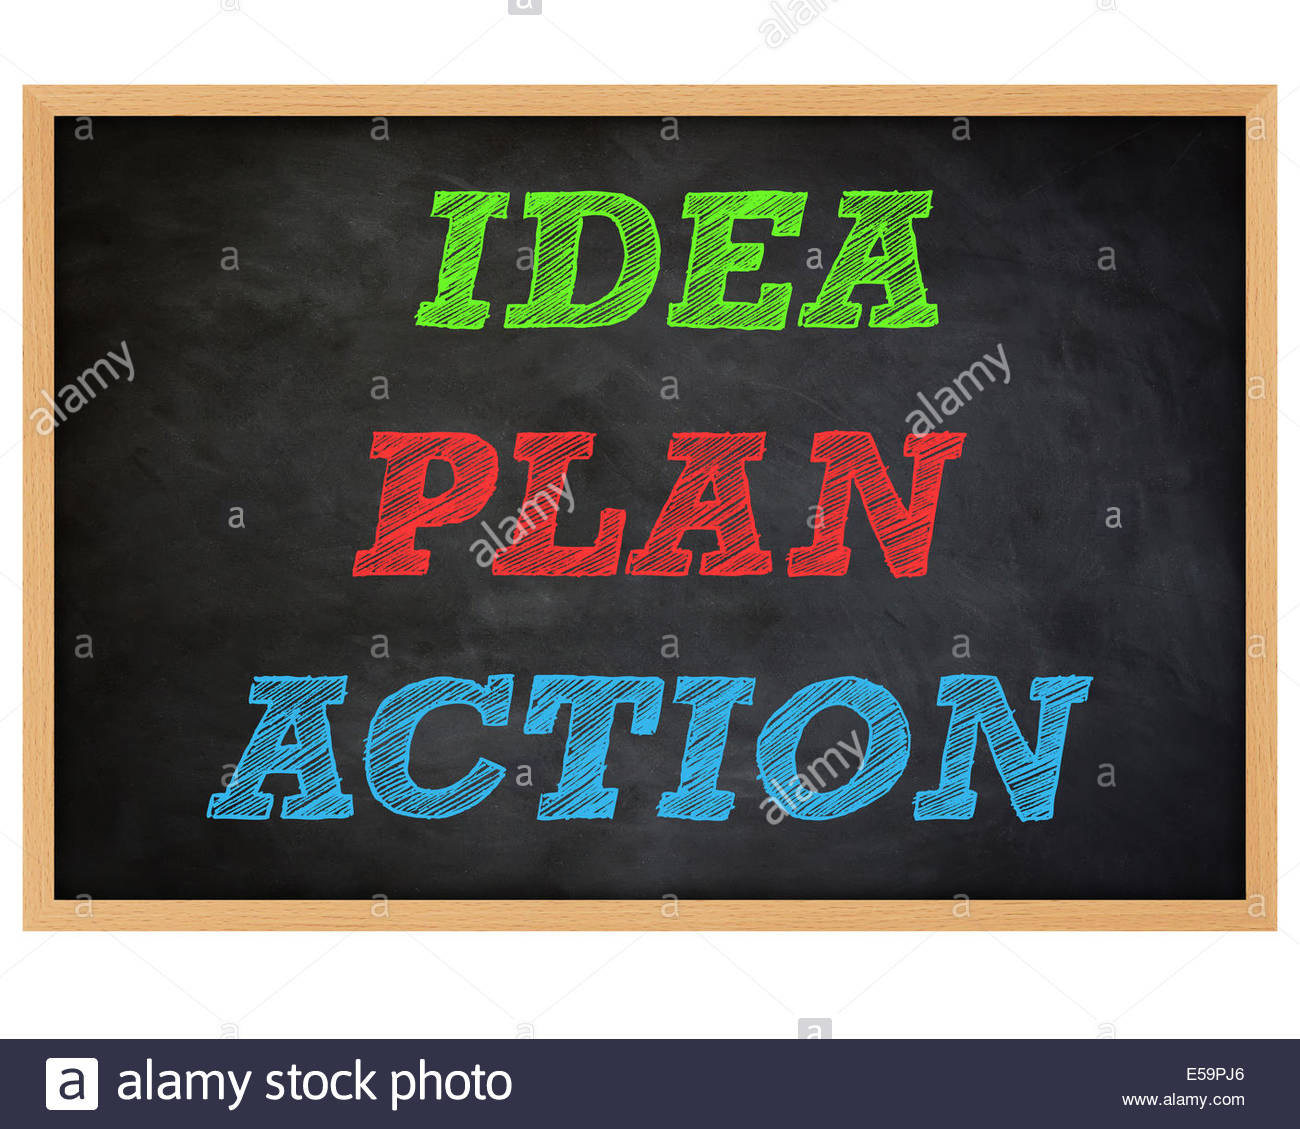 IDEA, PLAN, ACTION - handwritten concept chalkboard - Stock Image